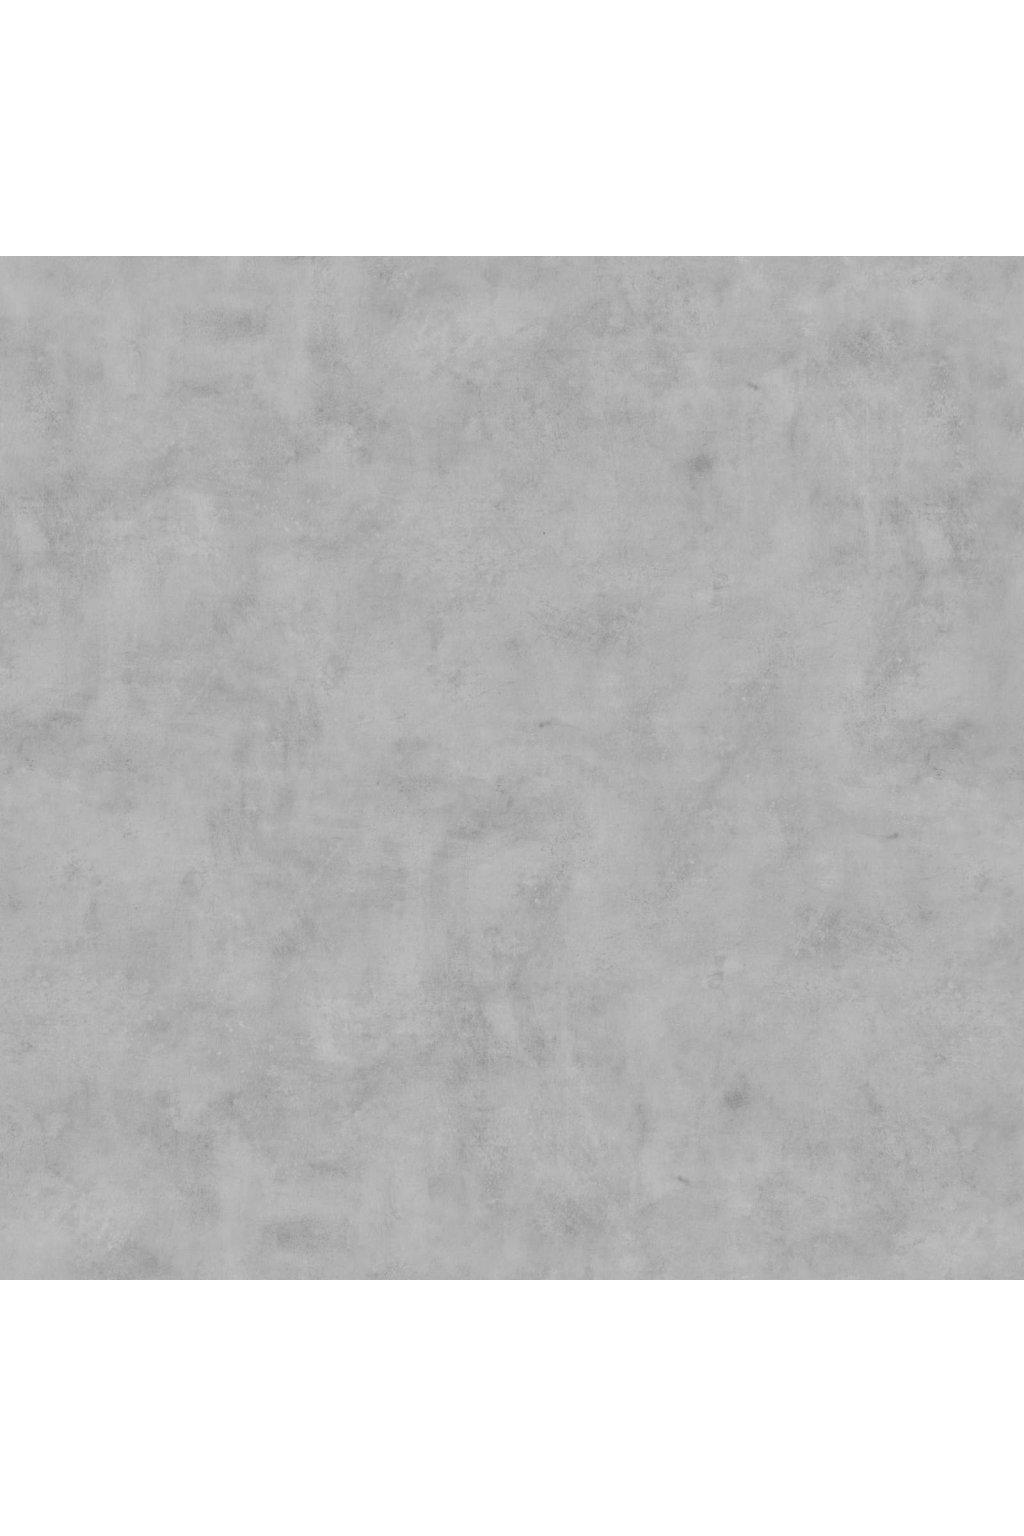 6407 145x95cm jpg